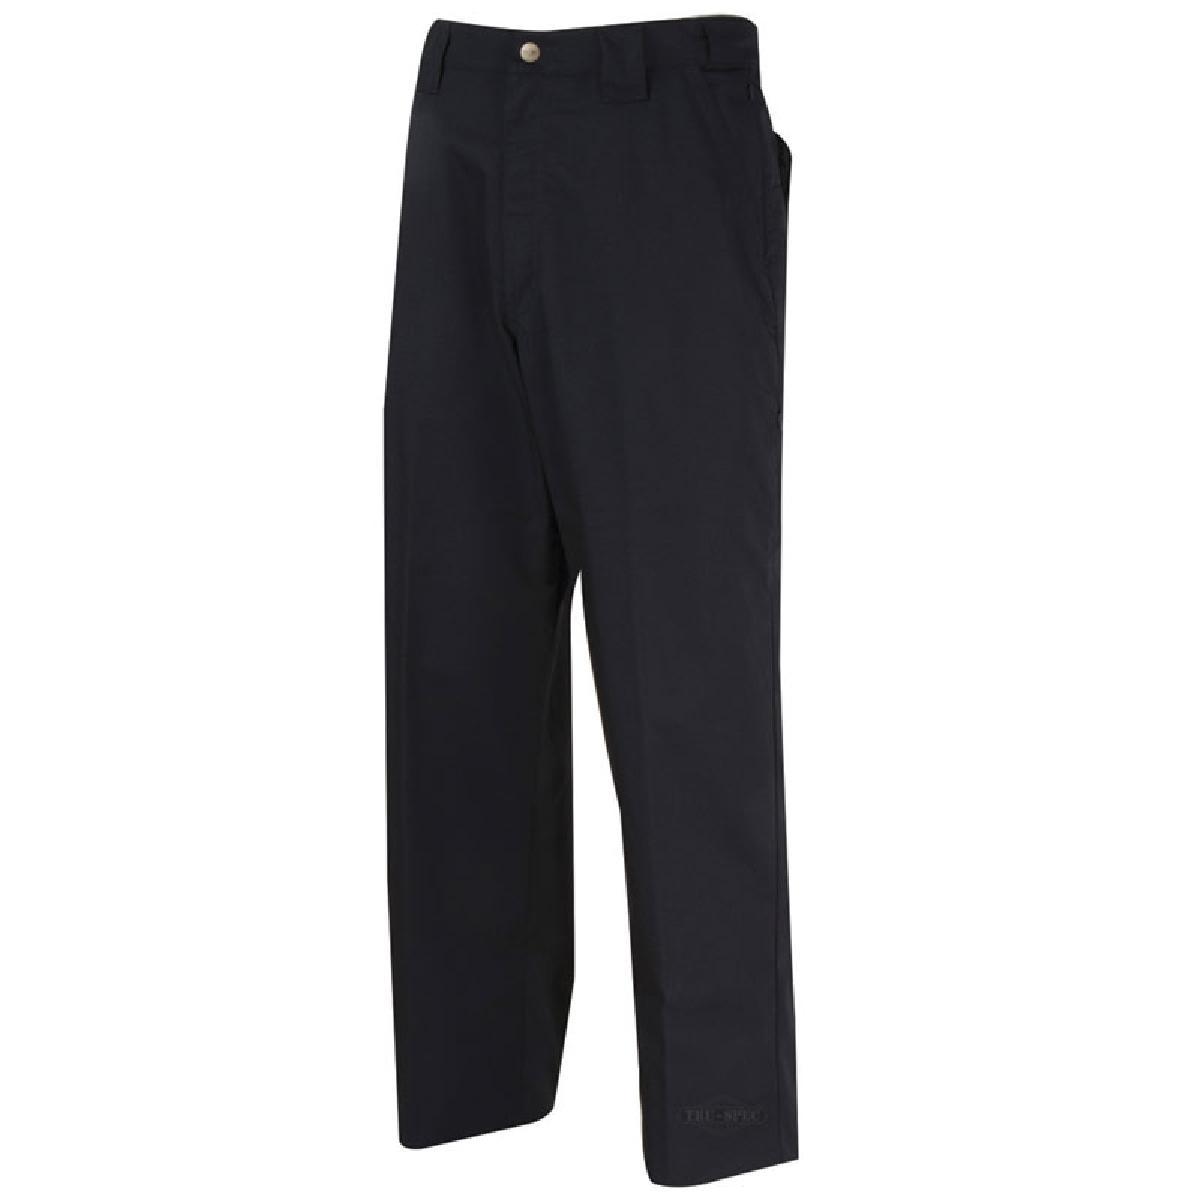 Tru-Spec 24-7 Series Mens Classic Pants Black